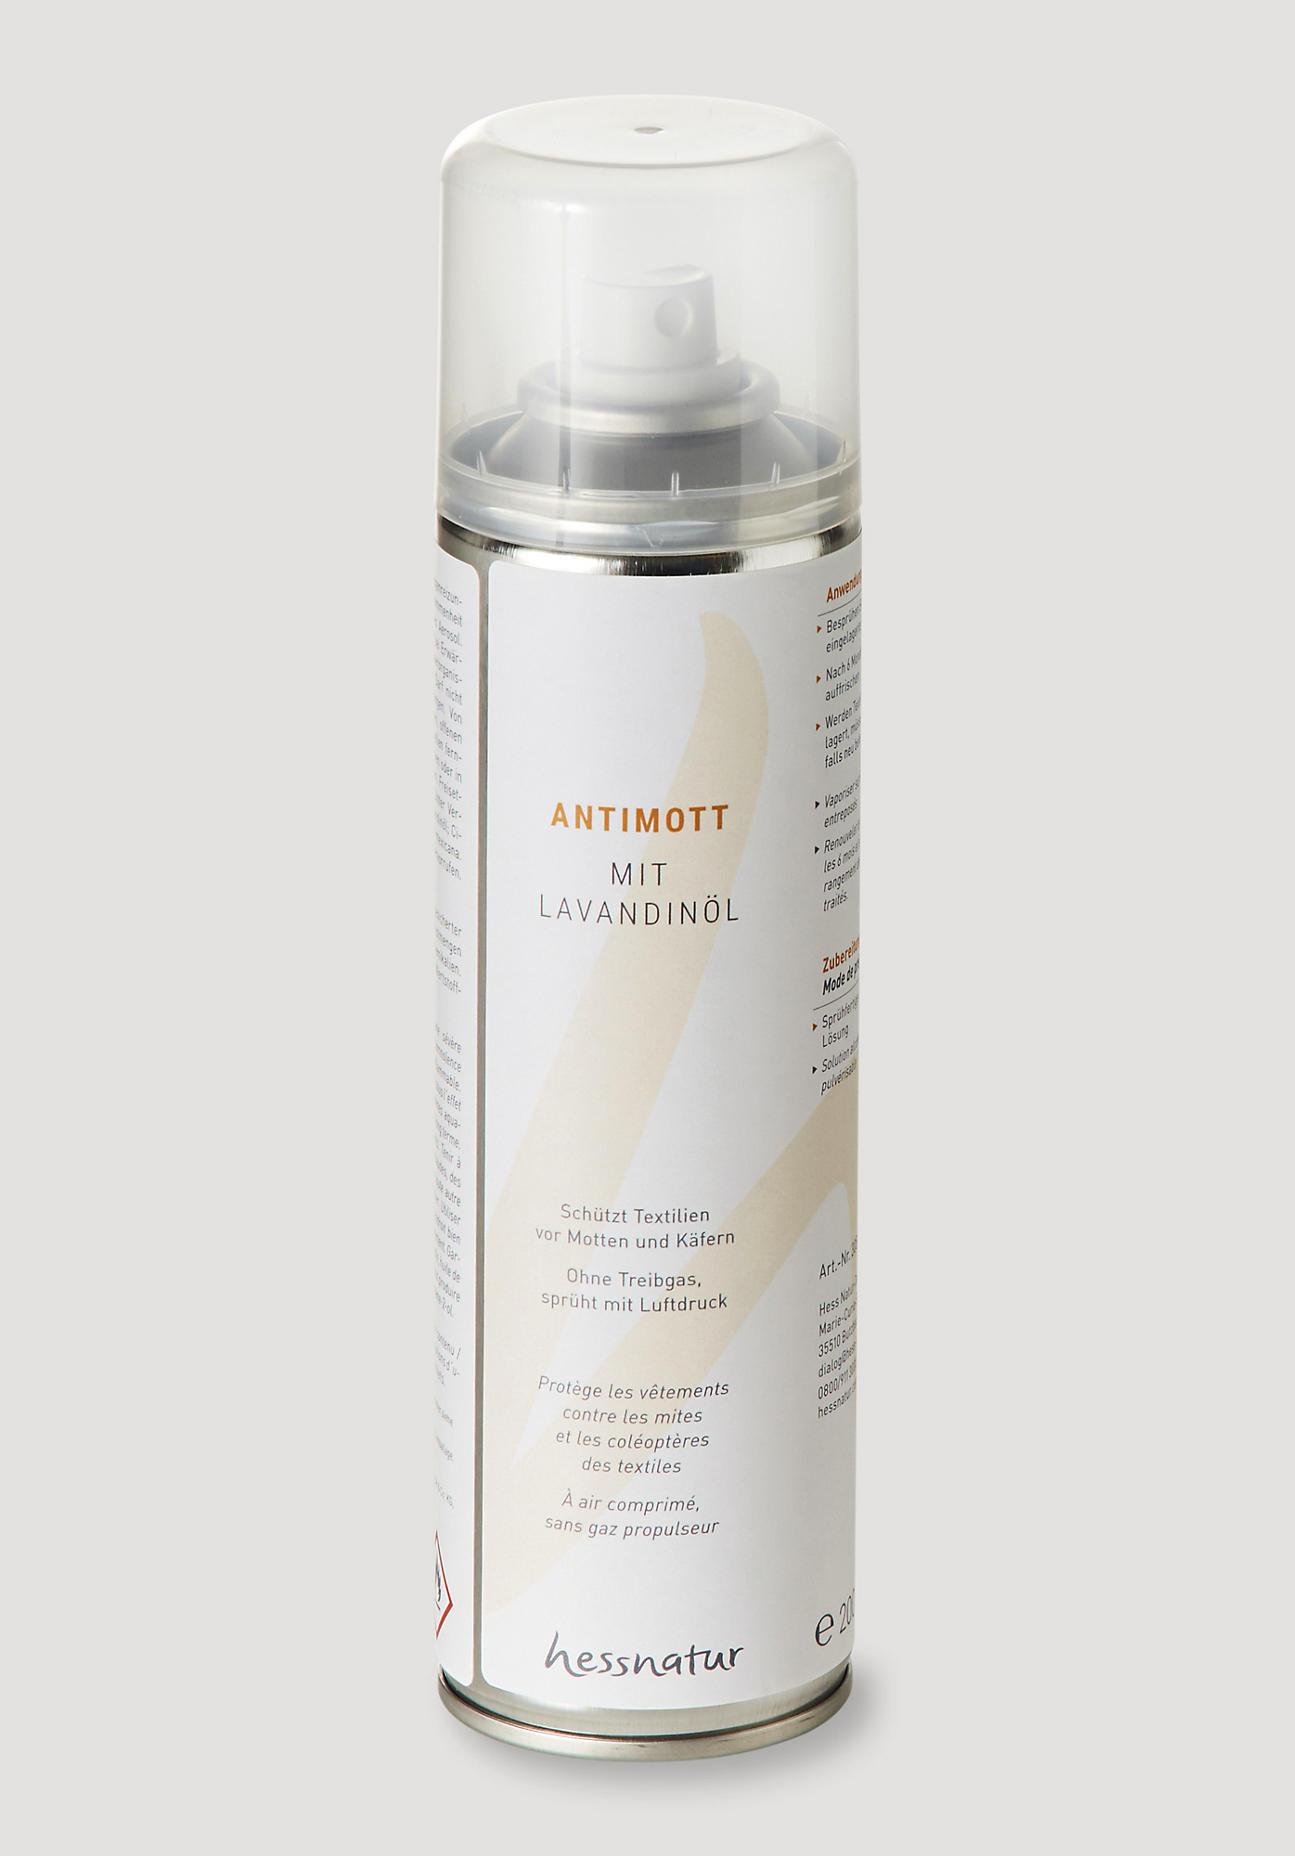 hessnatur Antimilbe Textil-Schutzspray – farblos – Größe 200ml